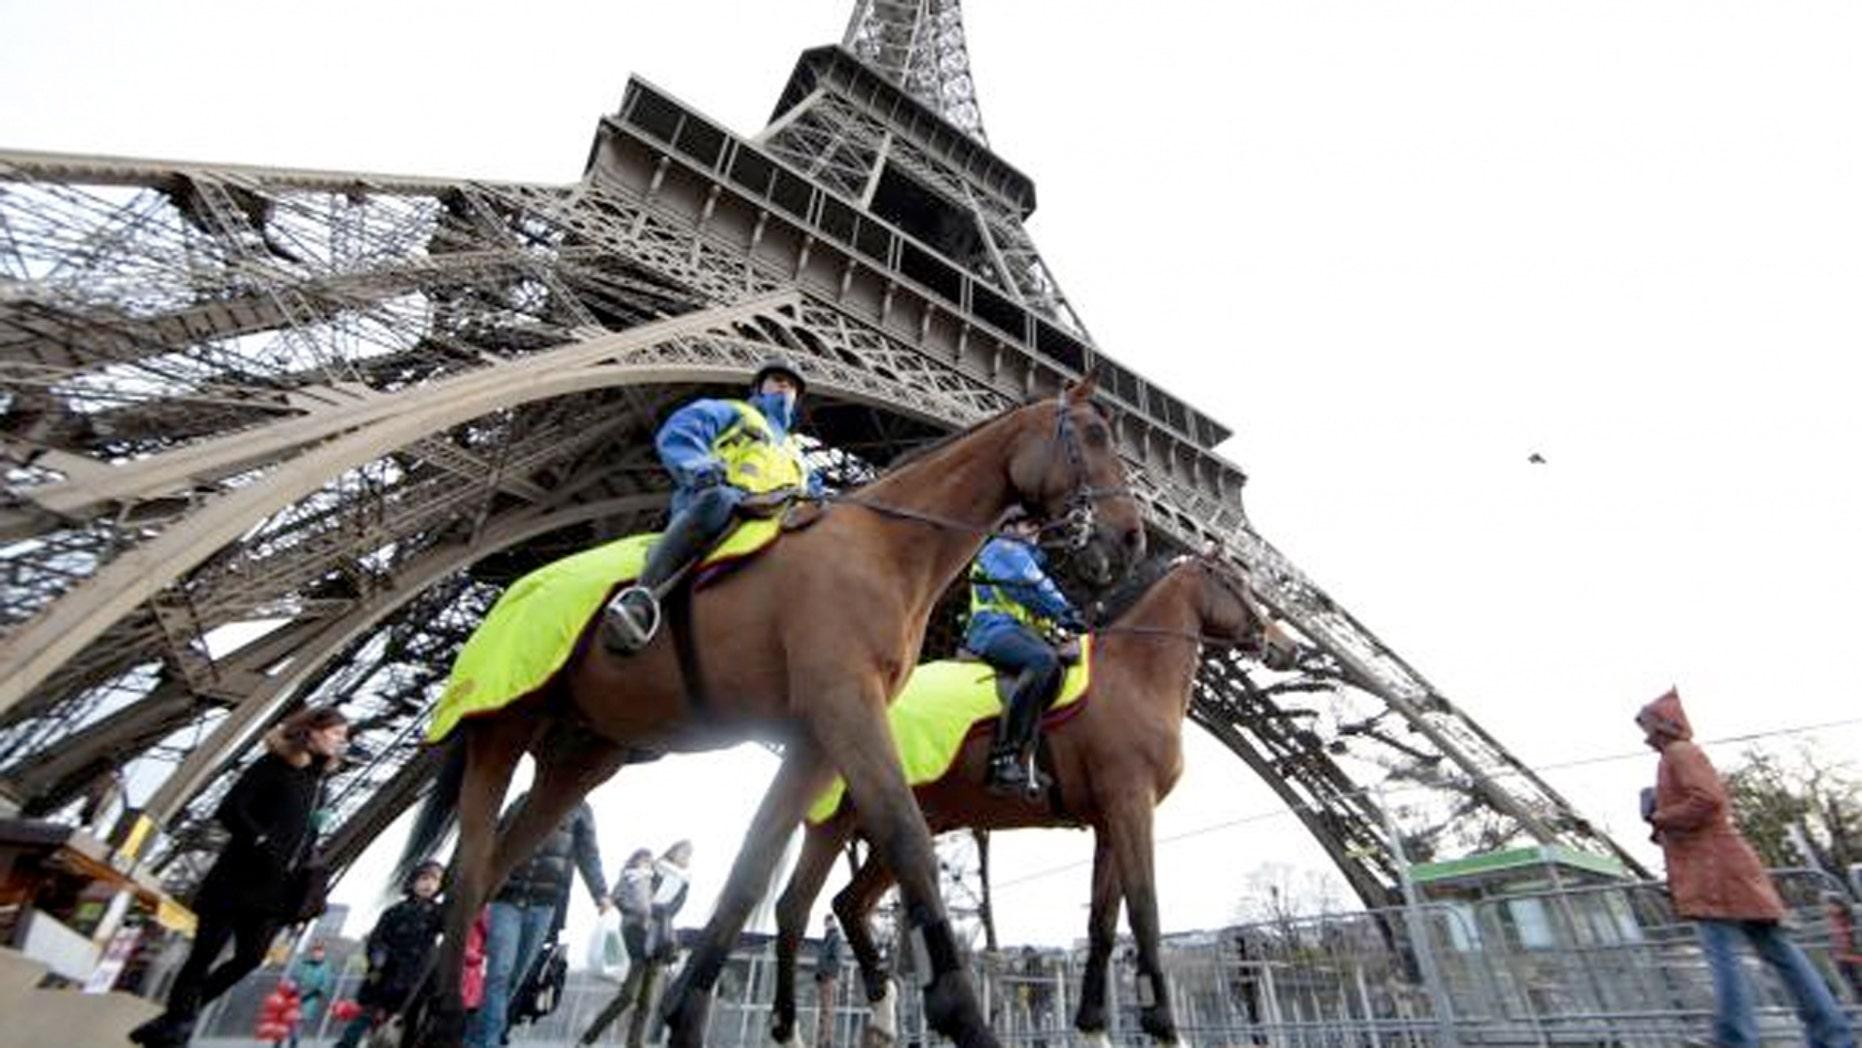 Police keep watch at Paris' Eiffel Tower.